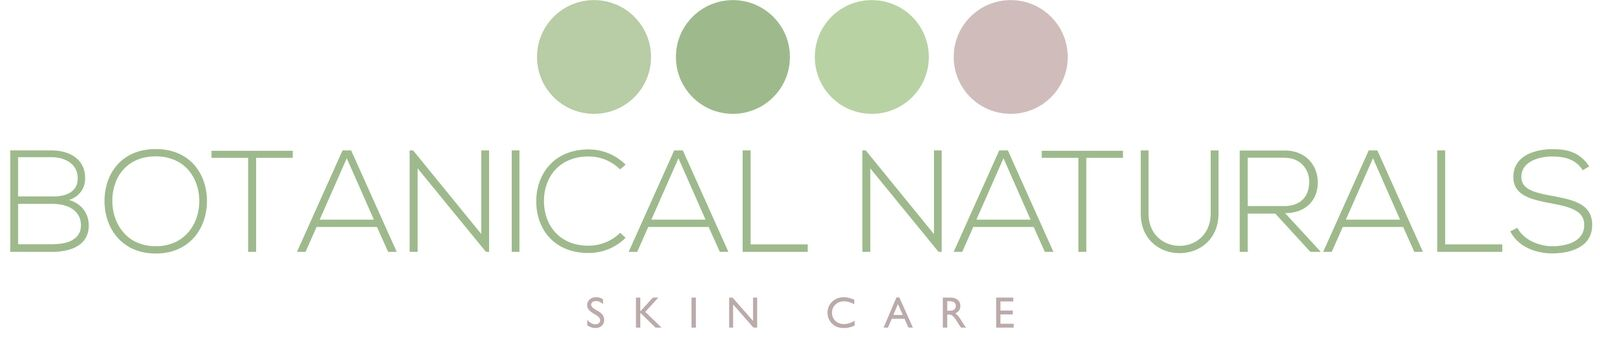 Botanical Naturals Skin Care